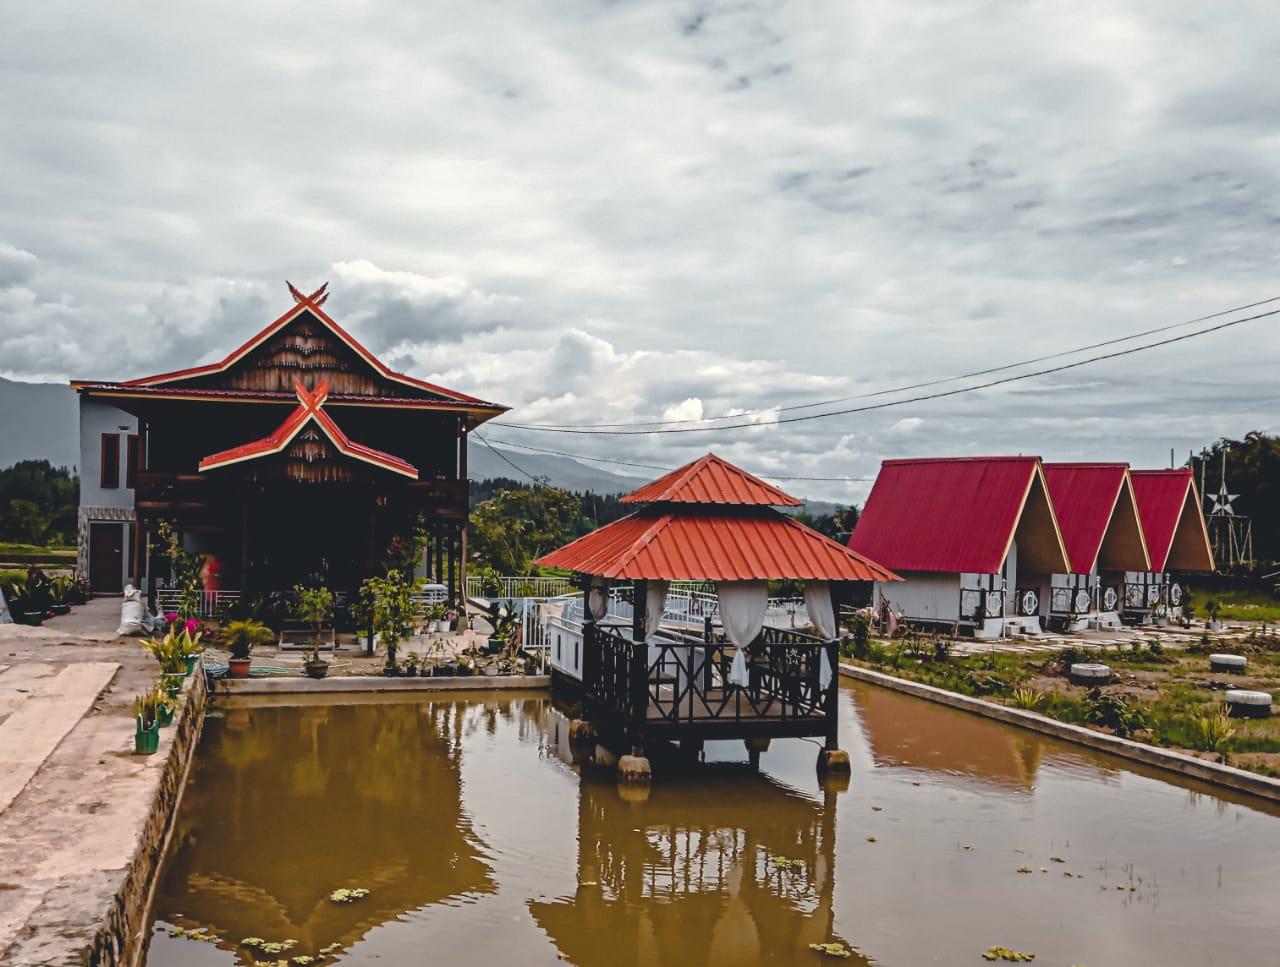 d'Breeze Villa Kini Hadir di Desa Wisata Tondok Bakaru